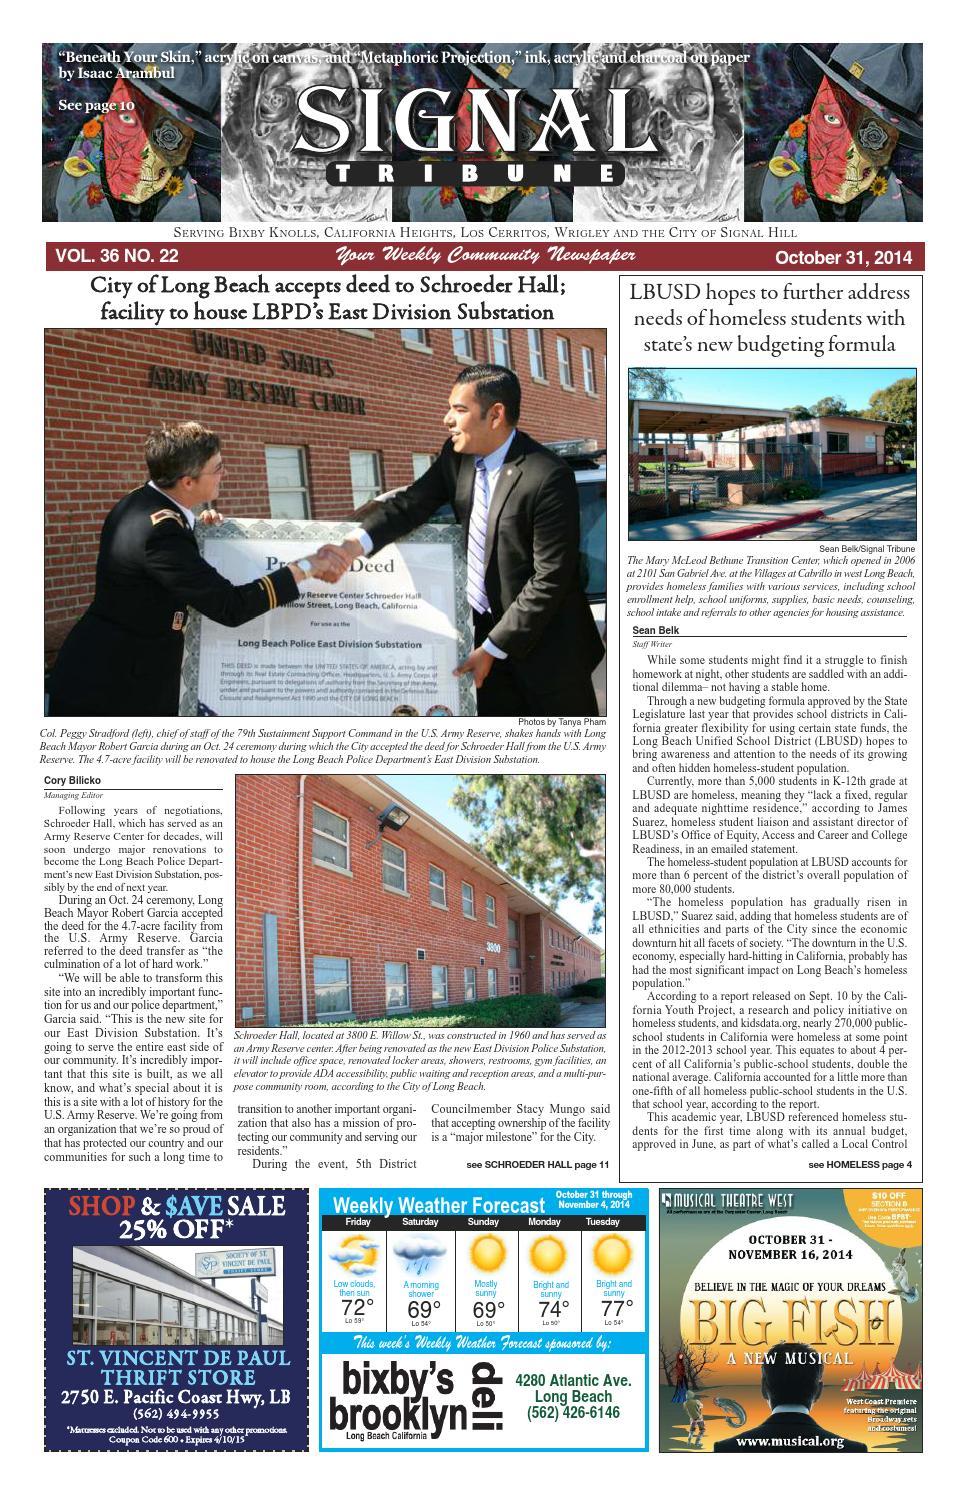 St3622 oct 31 layout 1 by Signal Tribune - issuu